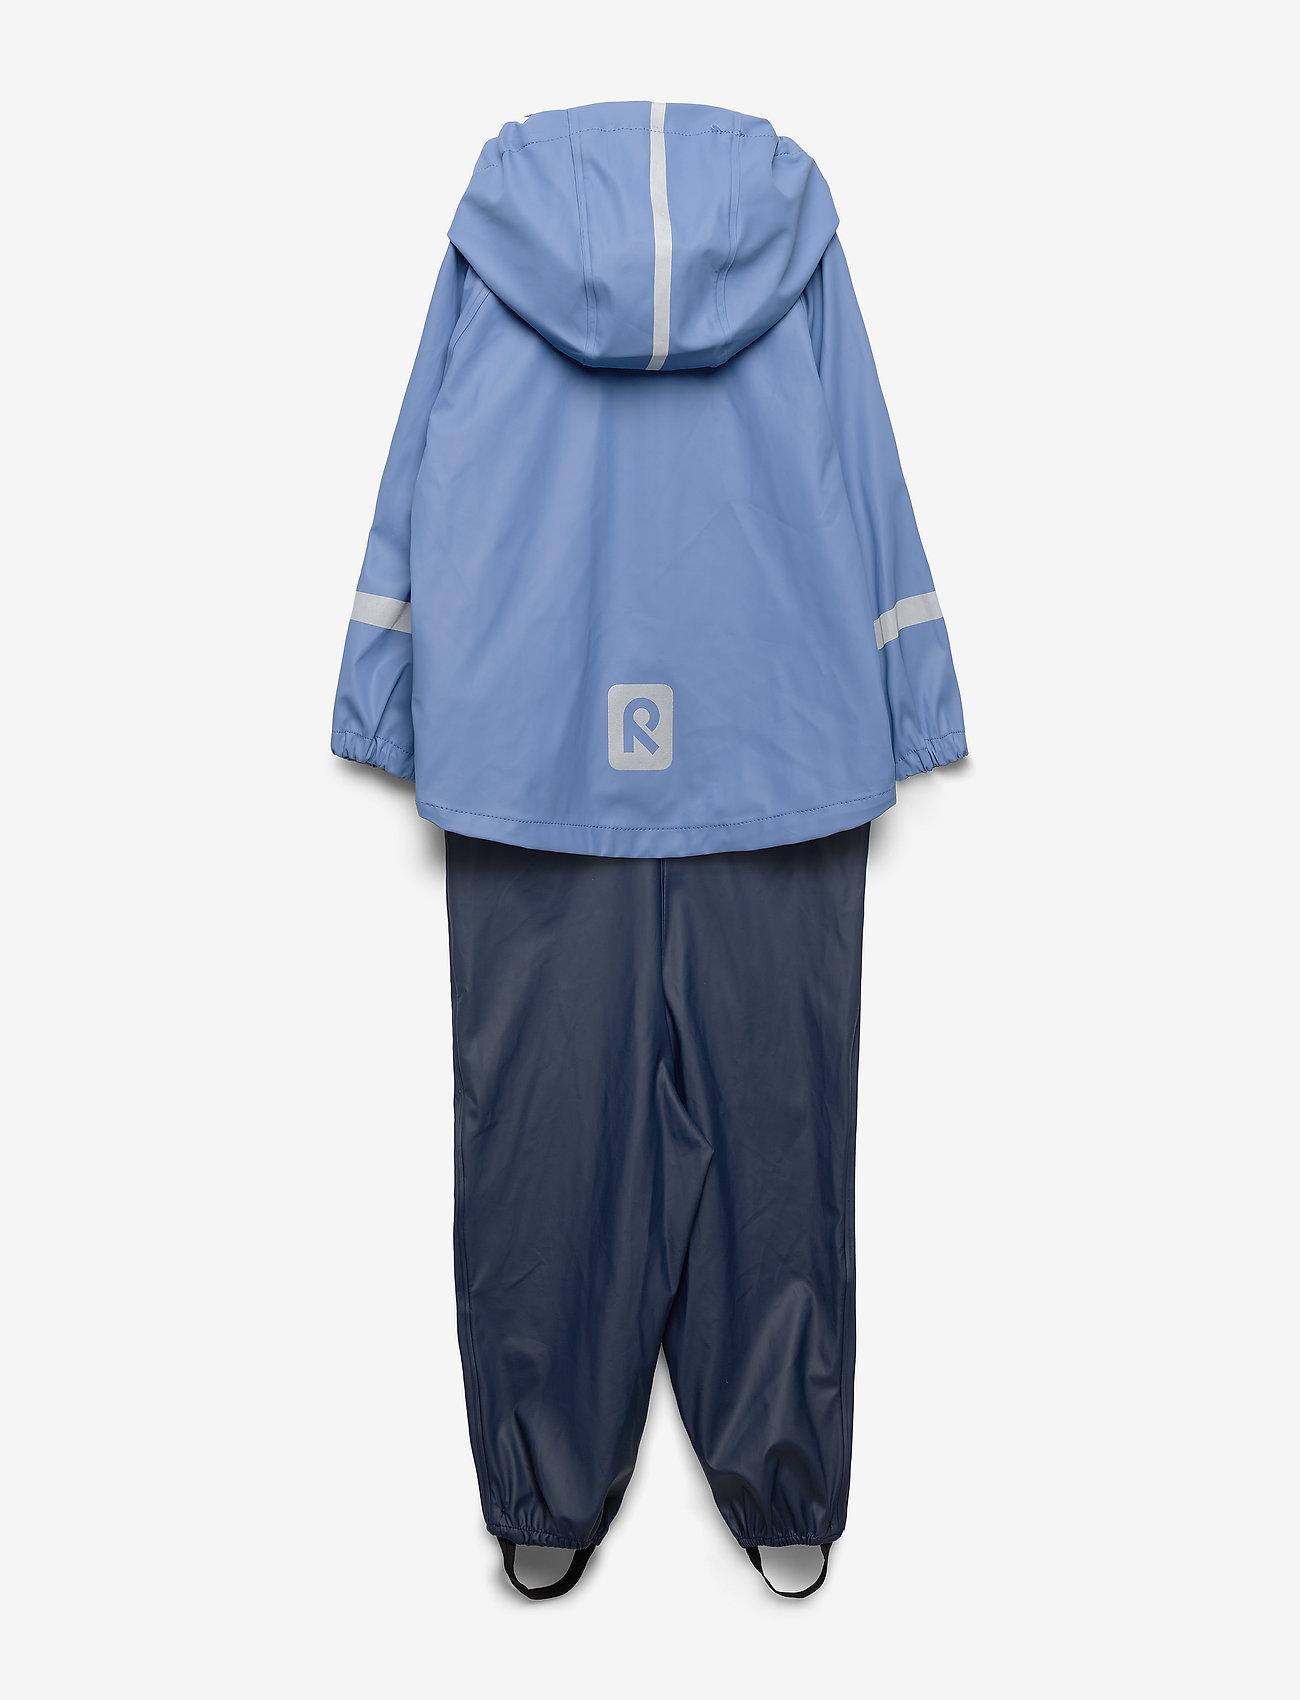 Reima - Tihku - coveralls - blue - 1